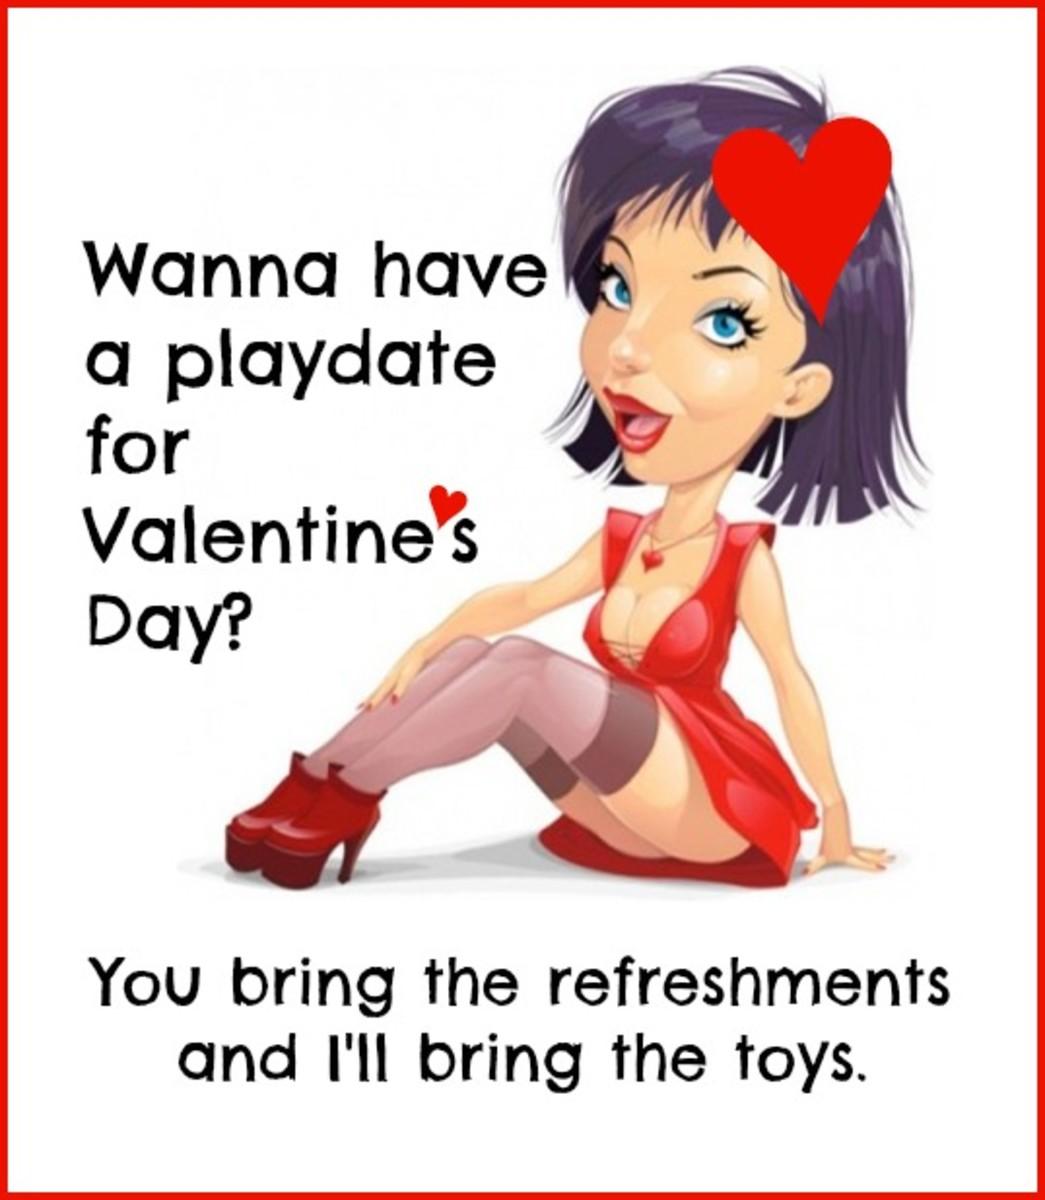 Sexy Valentine's Day Card